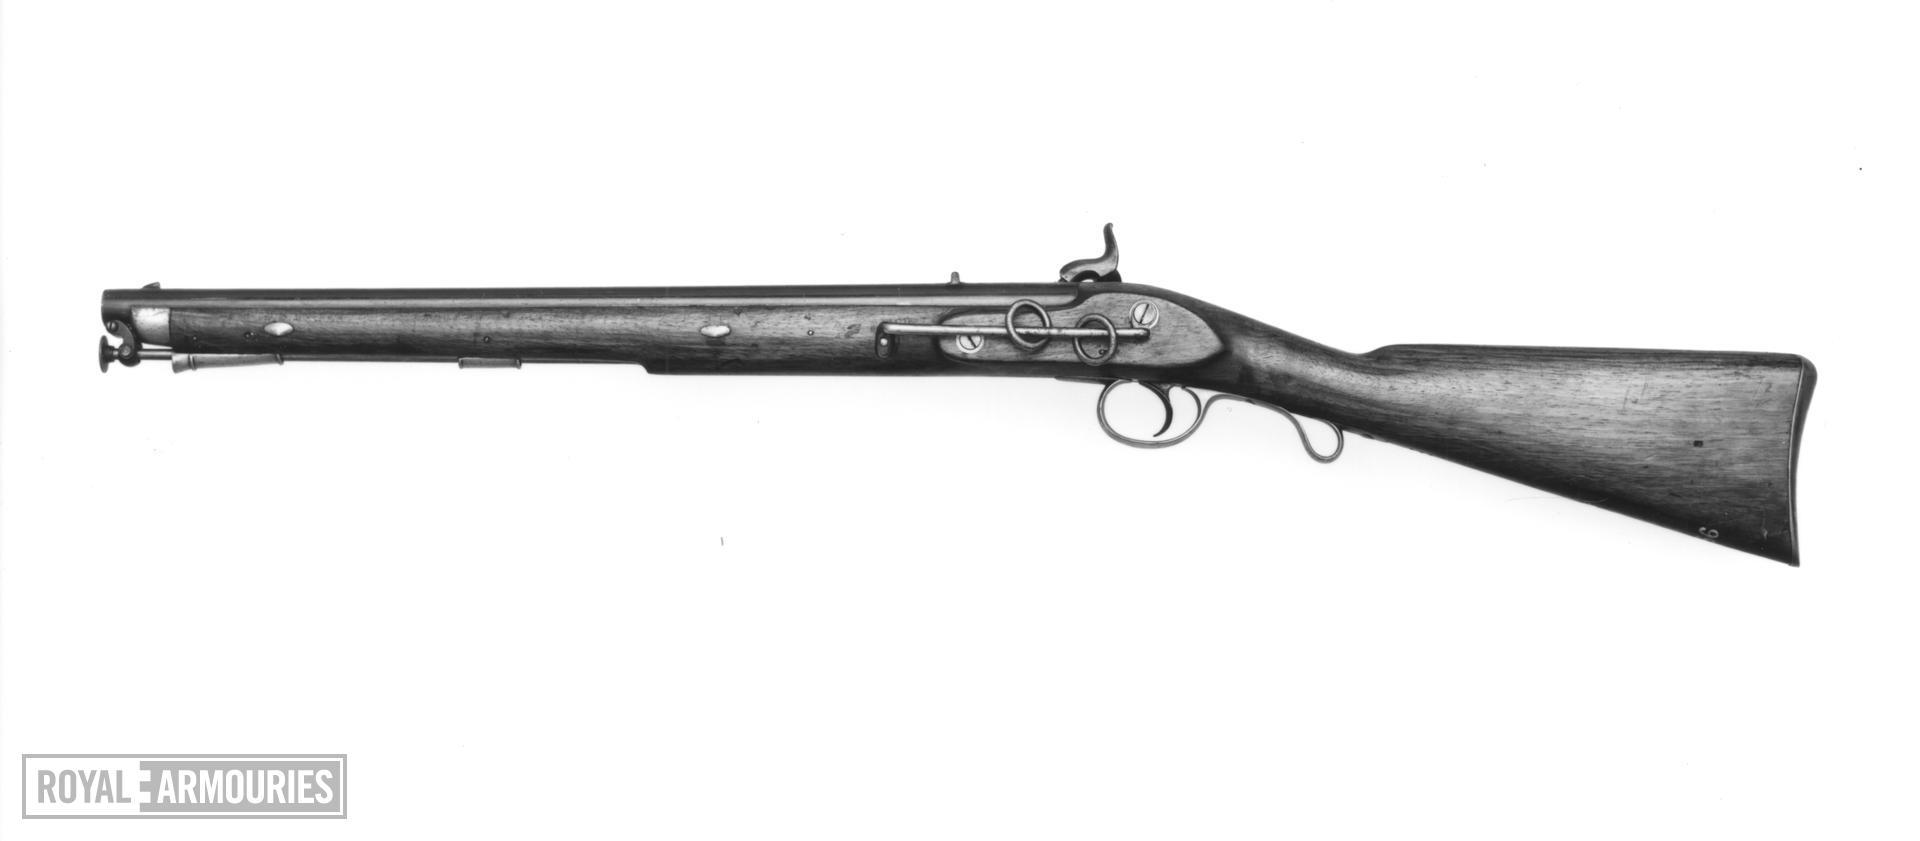 Percussion muzzle-loading military carbine East India Company Cavalry Carbine